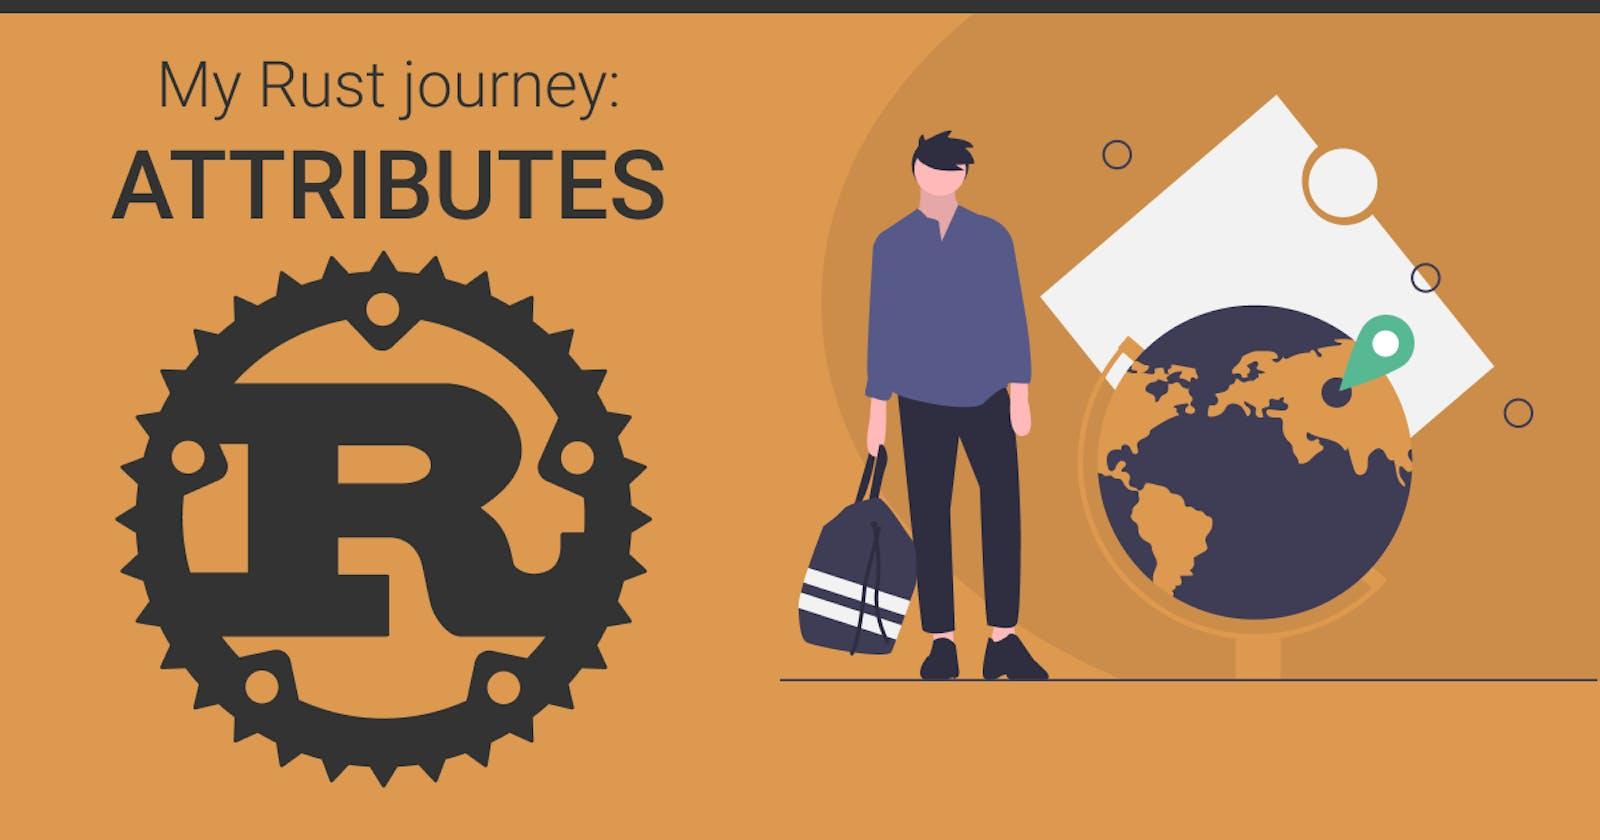 My Rust journey: Attributes